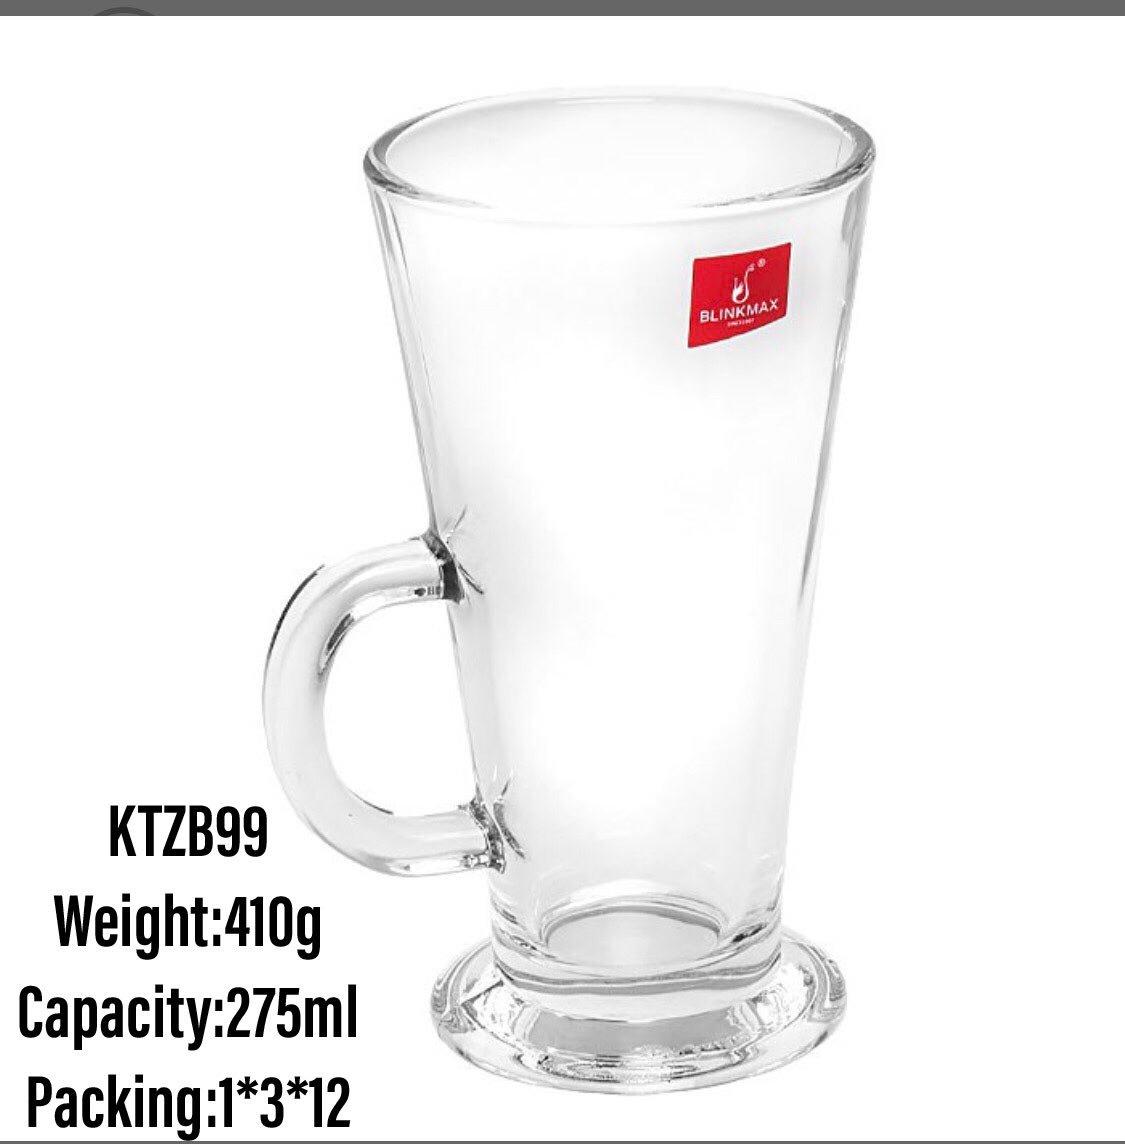 BlinkMax 9.3 ounce (275 ml) Irish Coffee Mug, 6-Piece Set